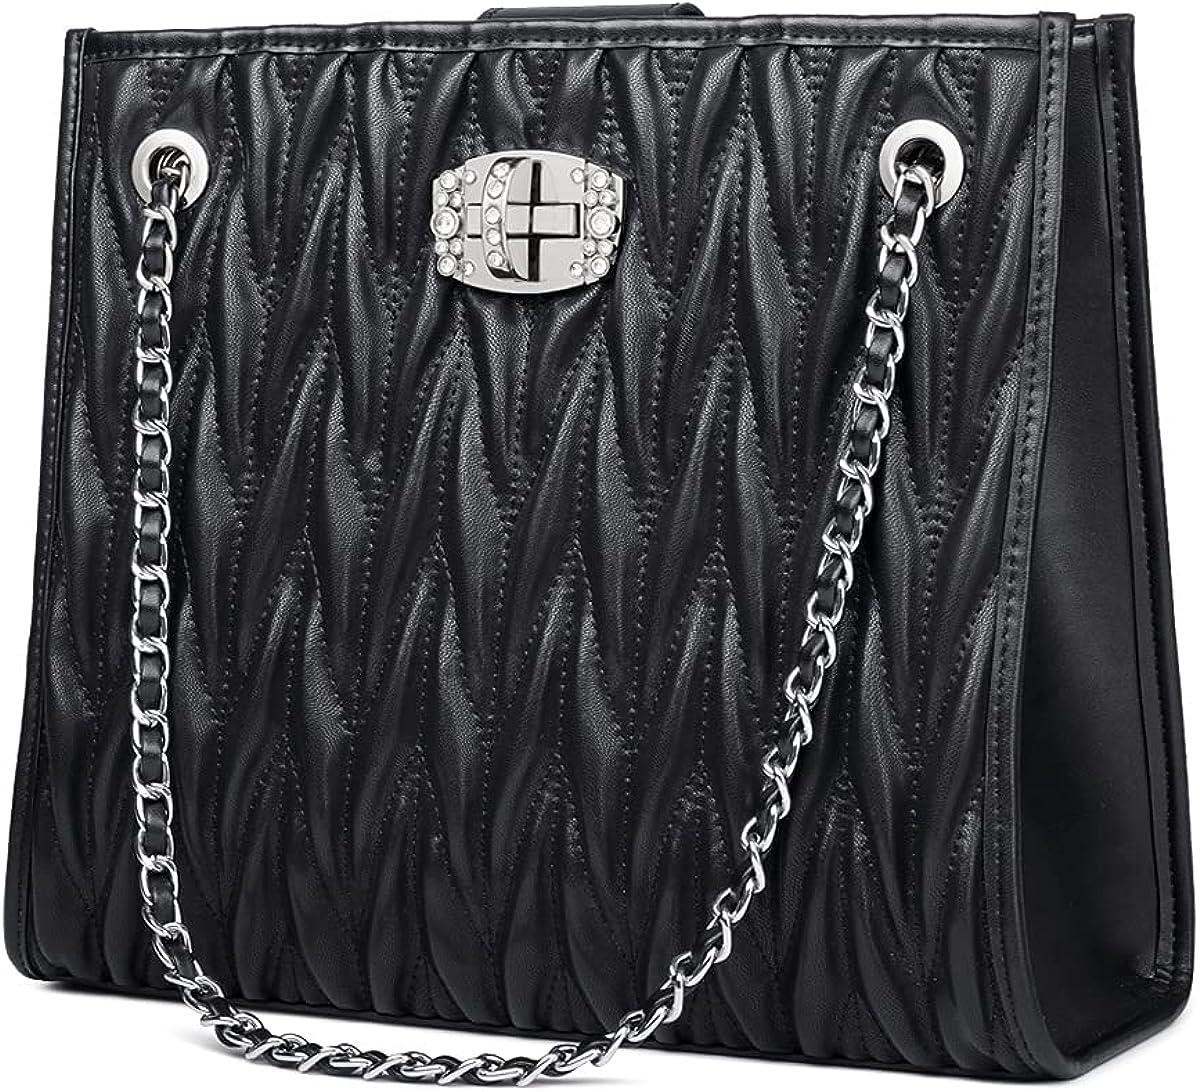 Crossbody Leather Bag Handbags Shoulder Bag for Women with Top Handle